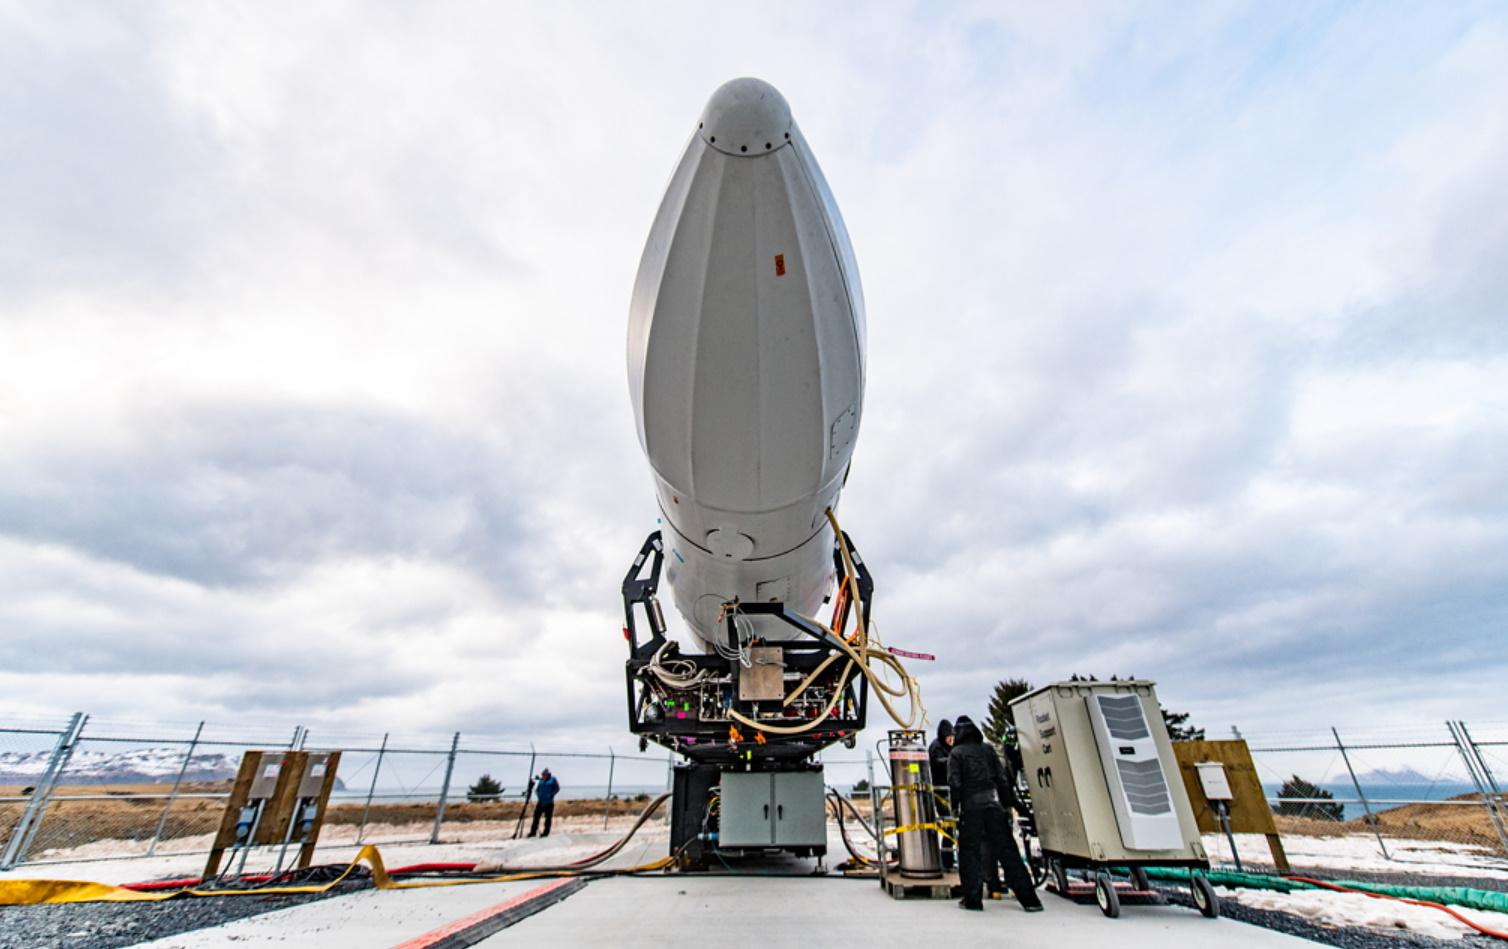 Astra, DARPA prepare for upcoming launch challenge - NASASpaceflight.com